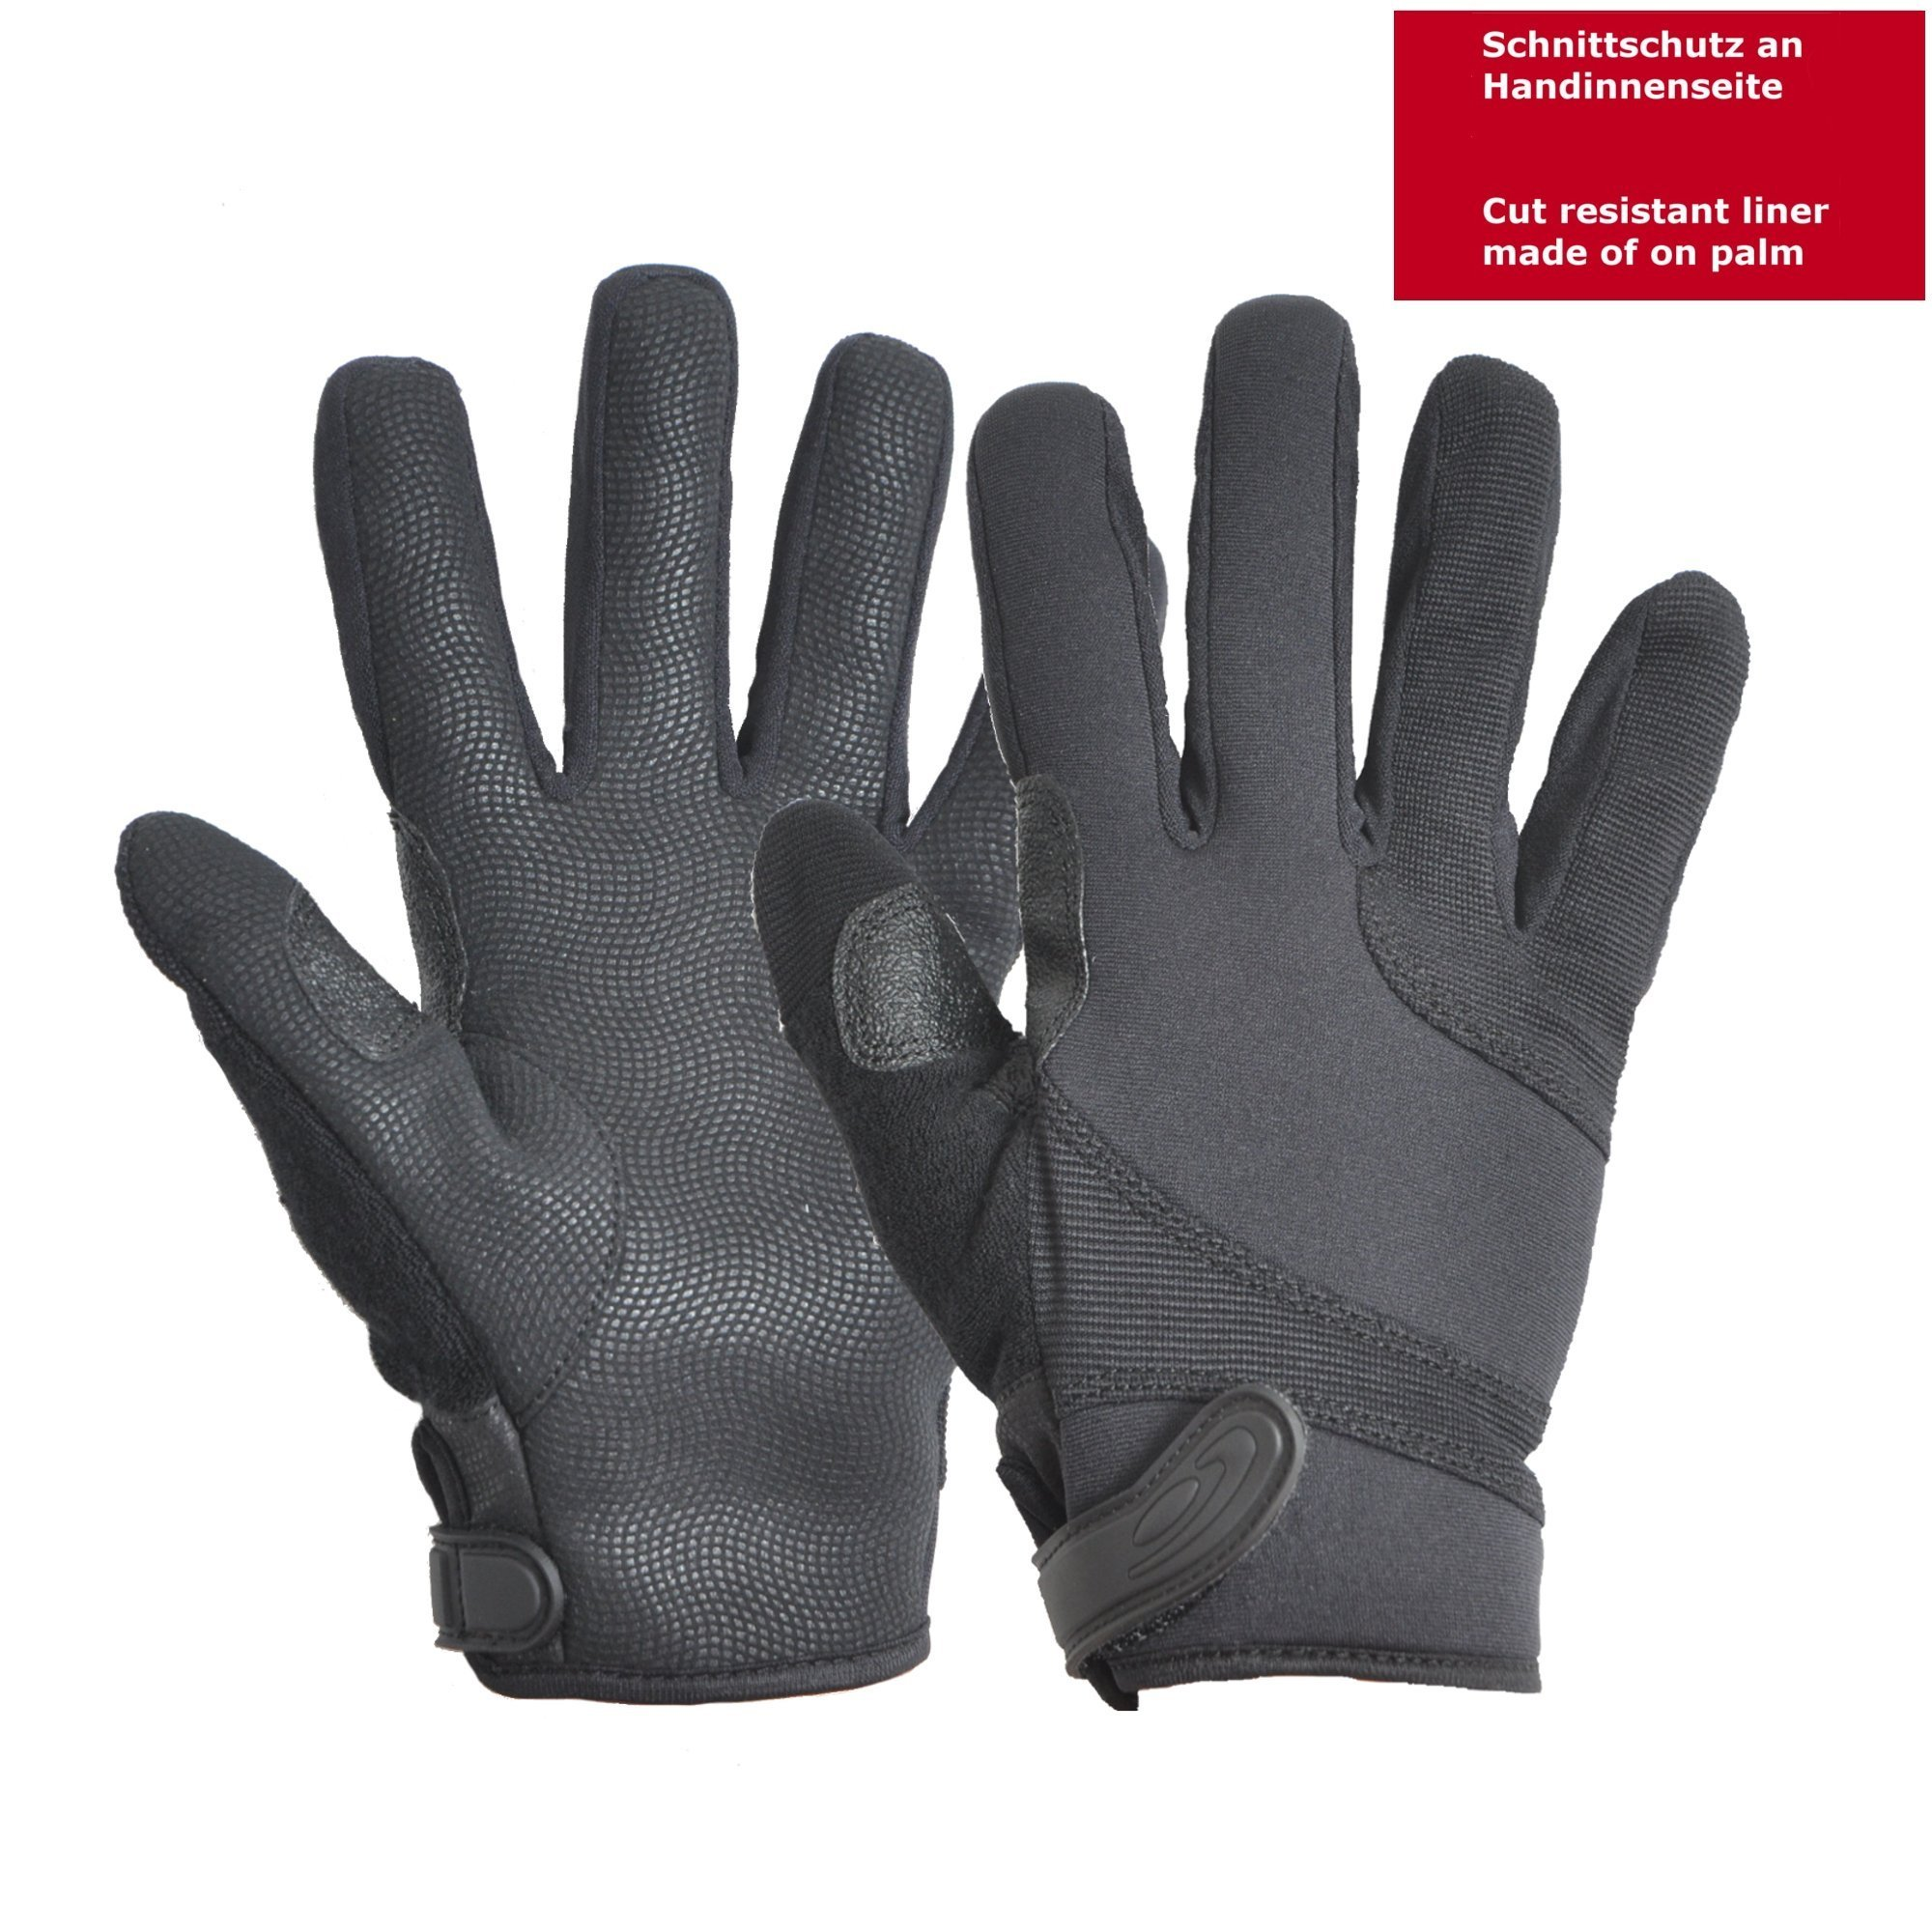 Hatch SGK100 Street Guard  Glove w/Kevlar, Black, Xsmall by Hatch